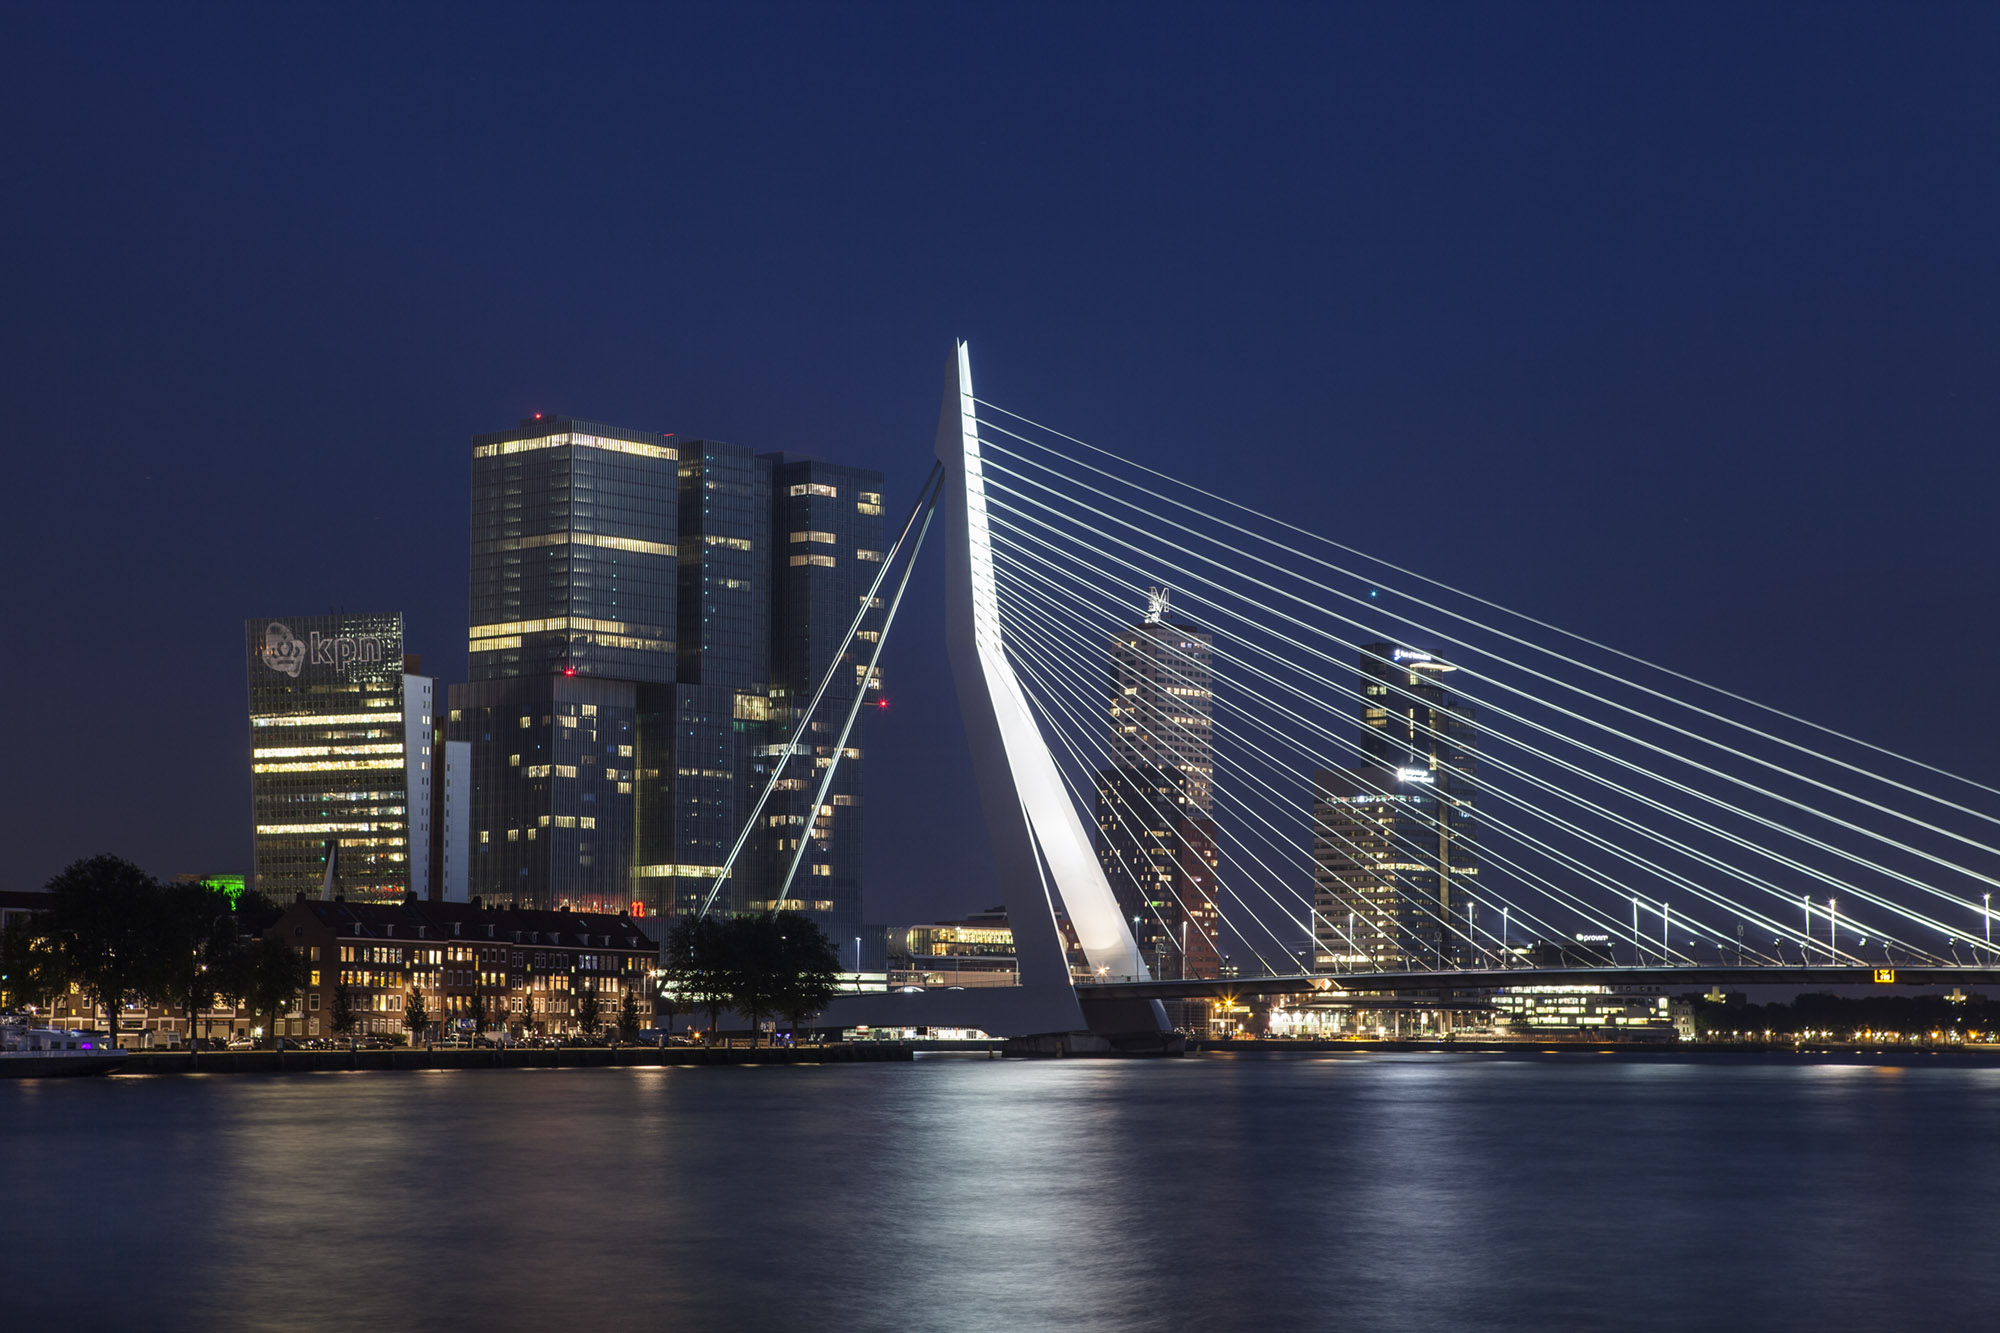 Rotterdam Erasmusbridge (erasmusbrug over de maas river) (c) Bart Coolen